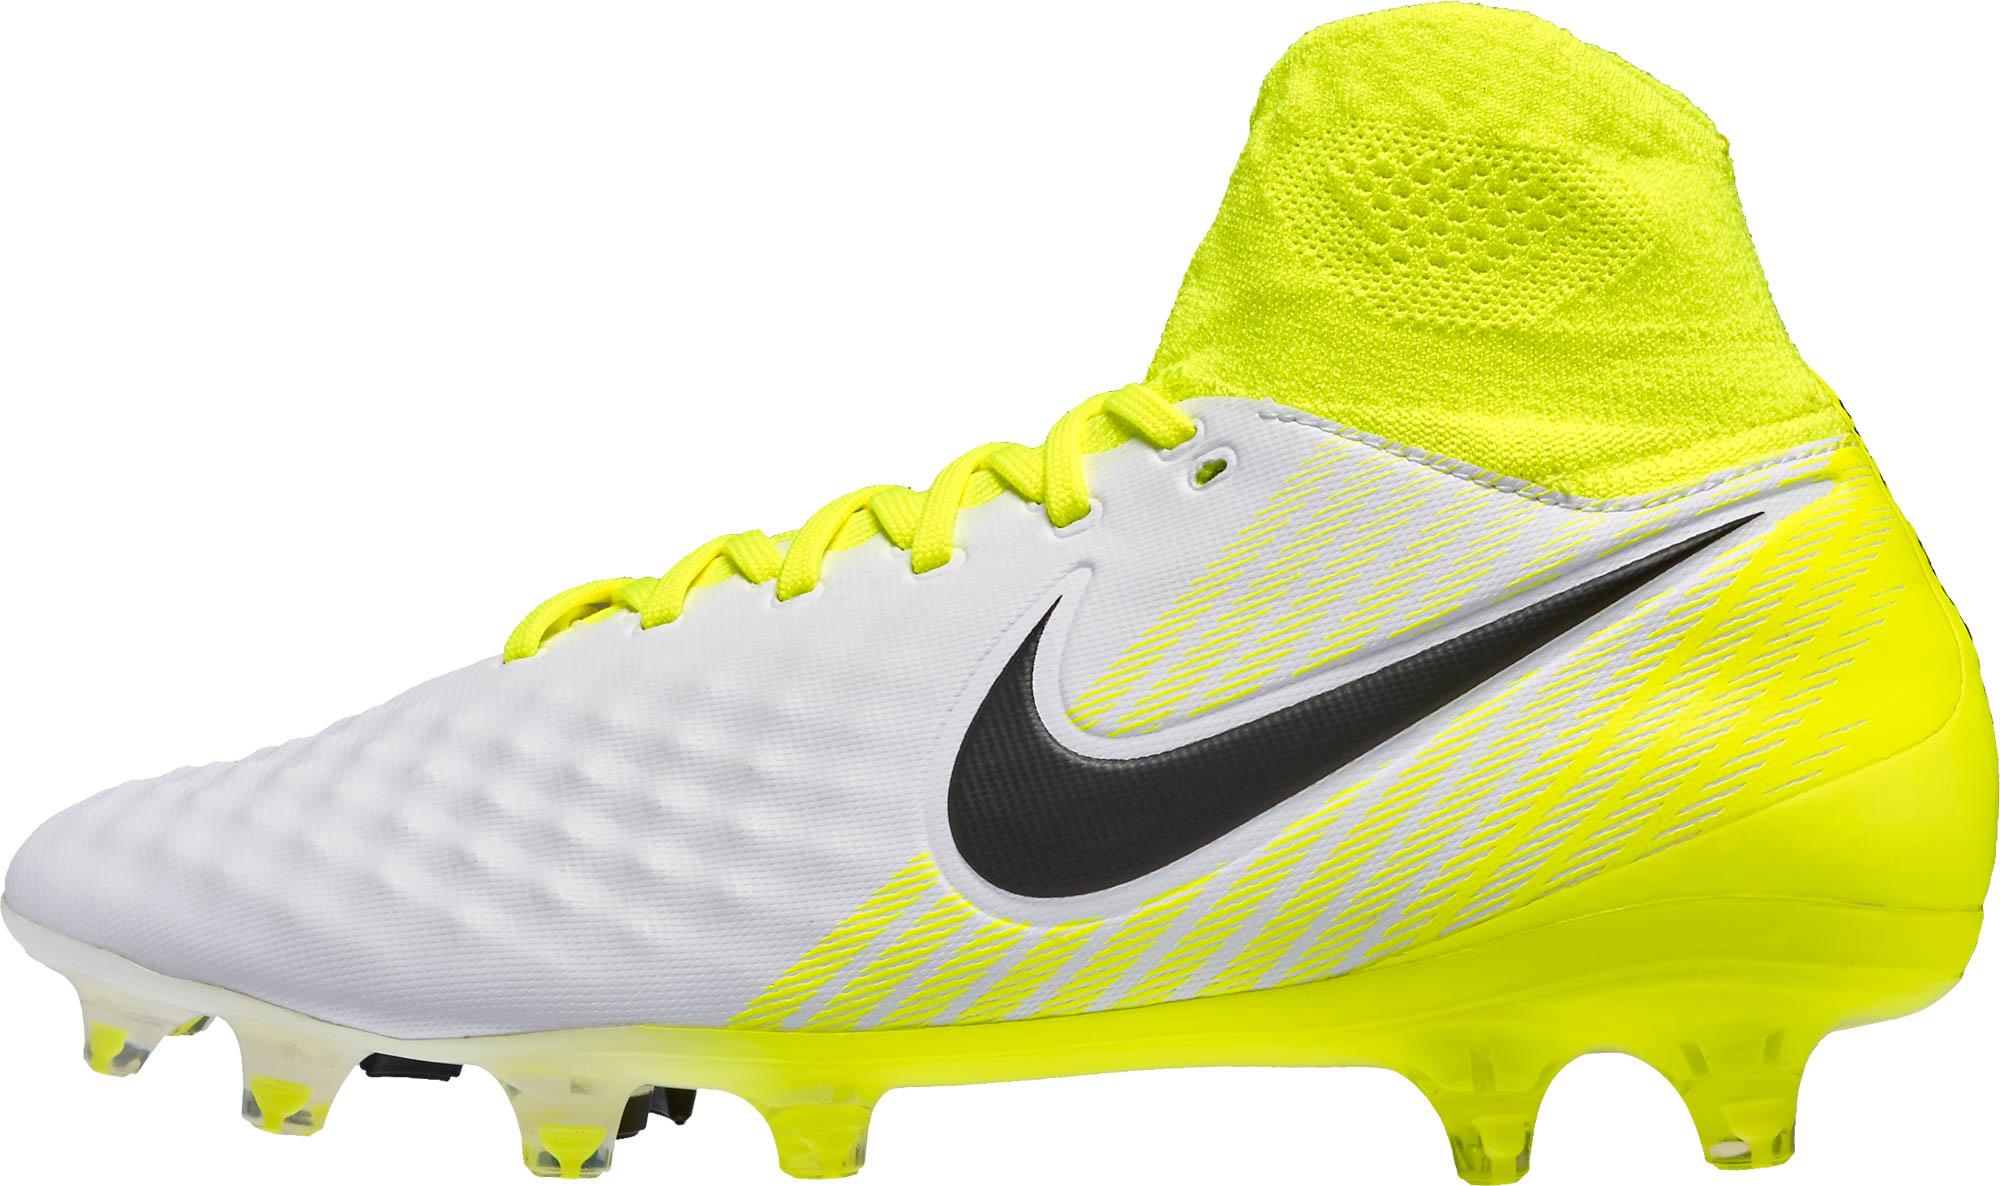 Nike Magista Orden II - White Magista Soccer Cleats